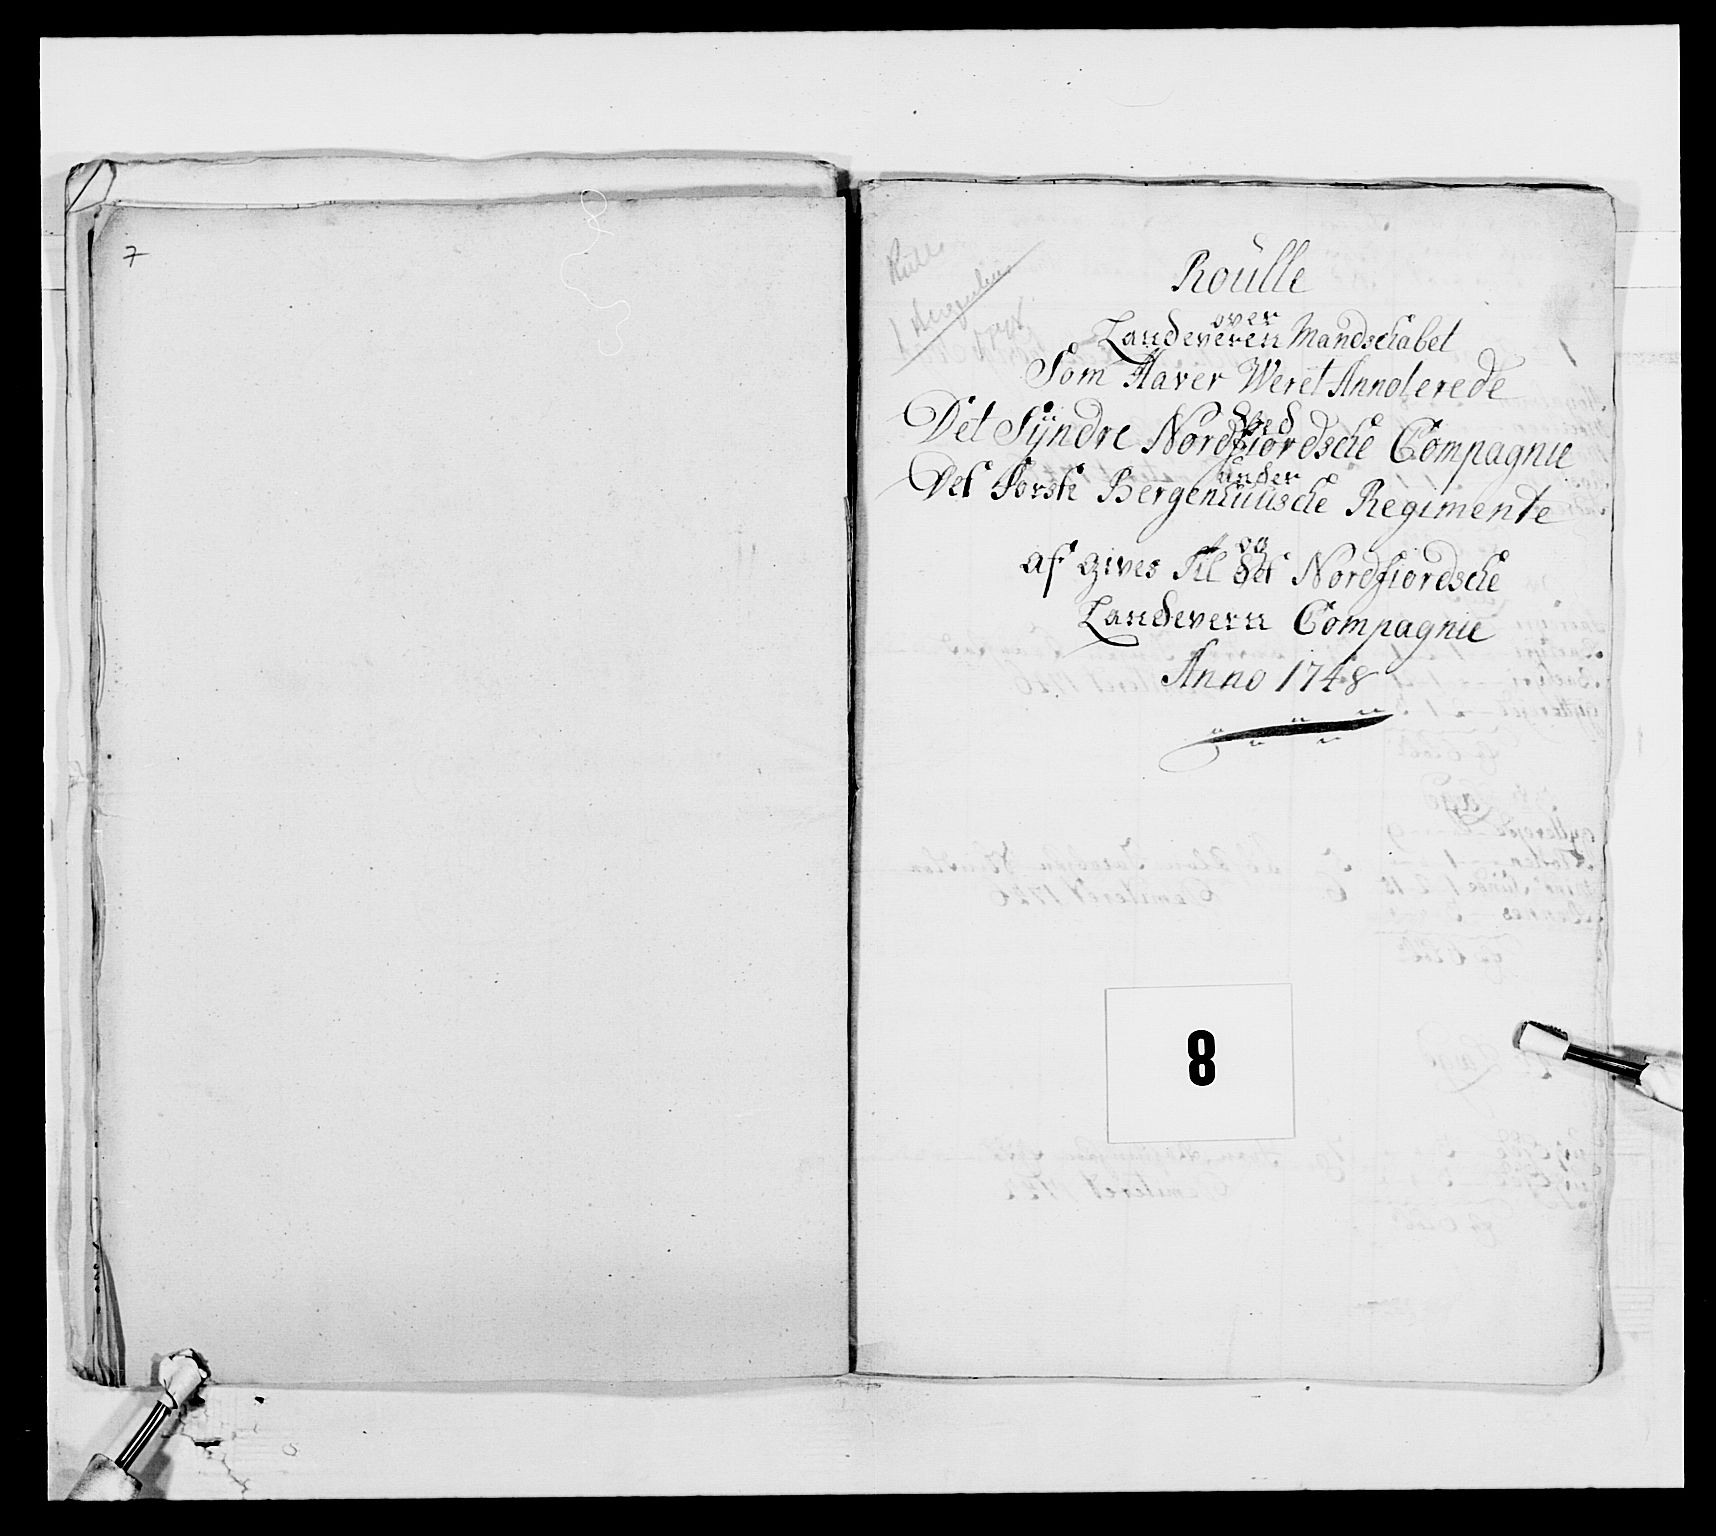 RA, Kommanderende general (KG I) med Det norske krigsdirektorium, E/Ea/L0517: 1. Bergenhusiske regiment, 1742-1756, s. 54